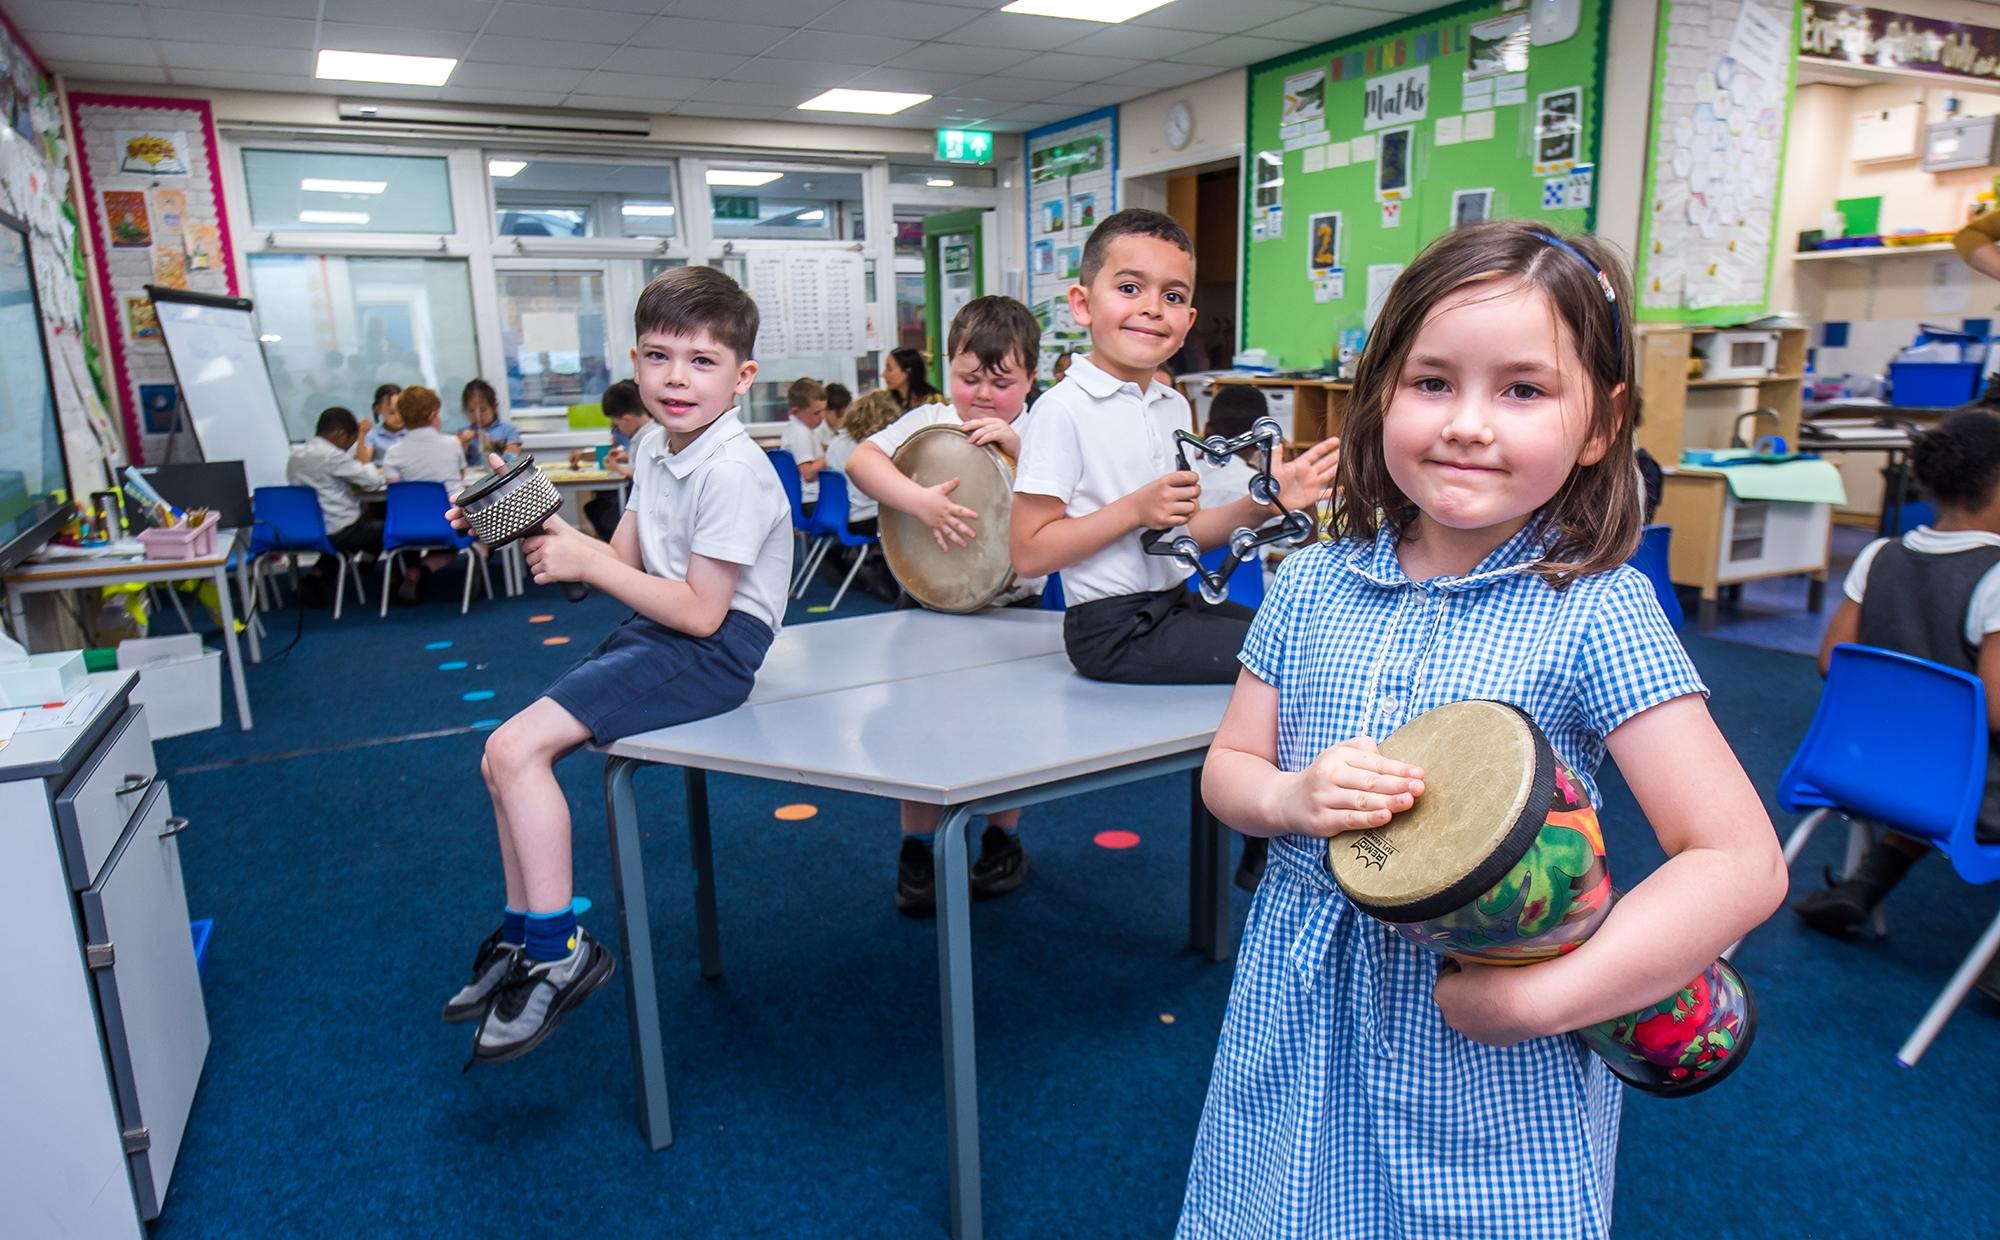 LKS2 children playing